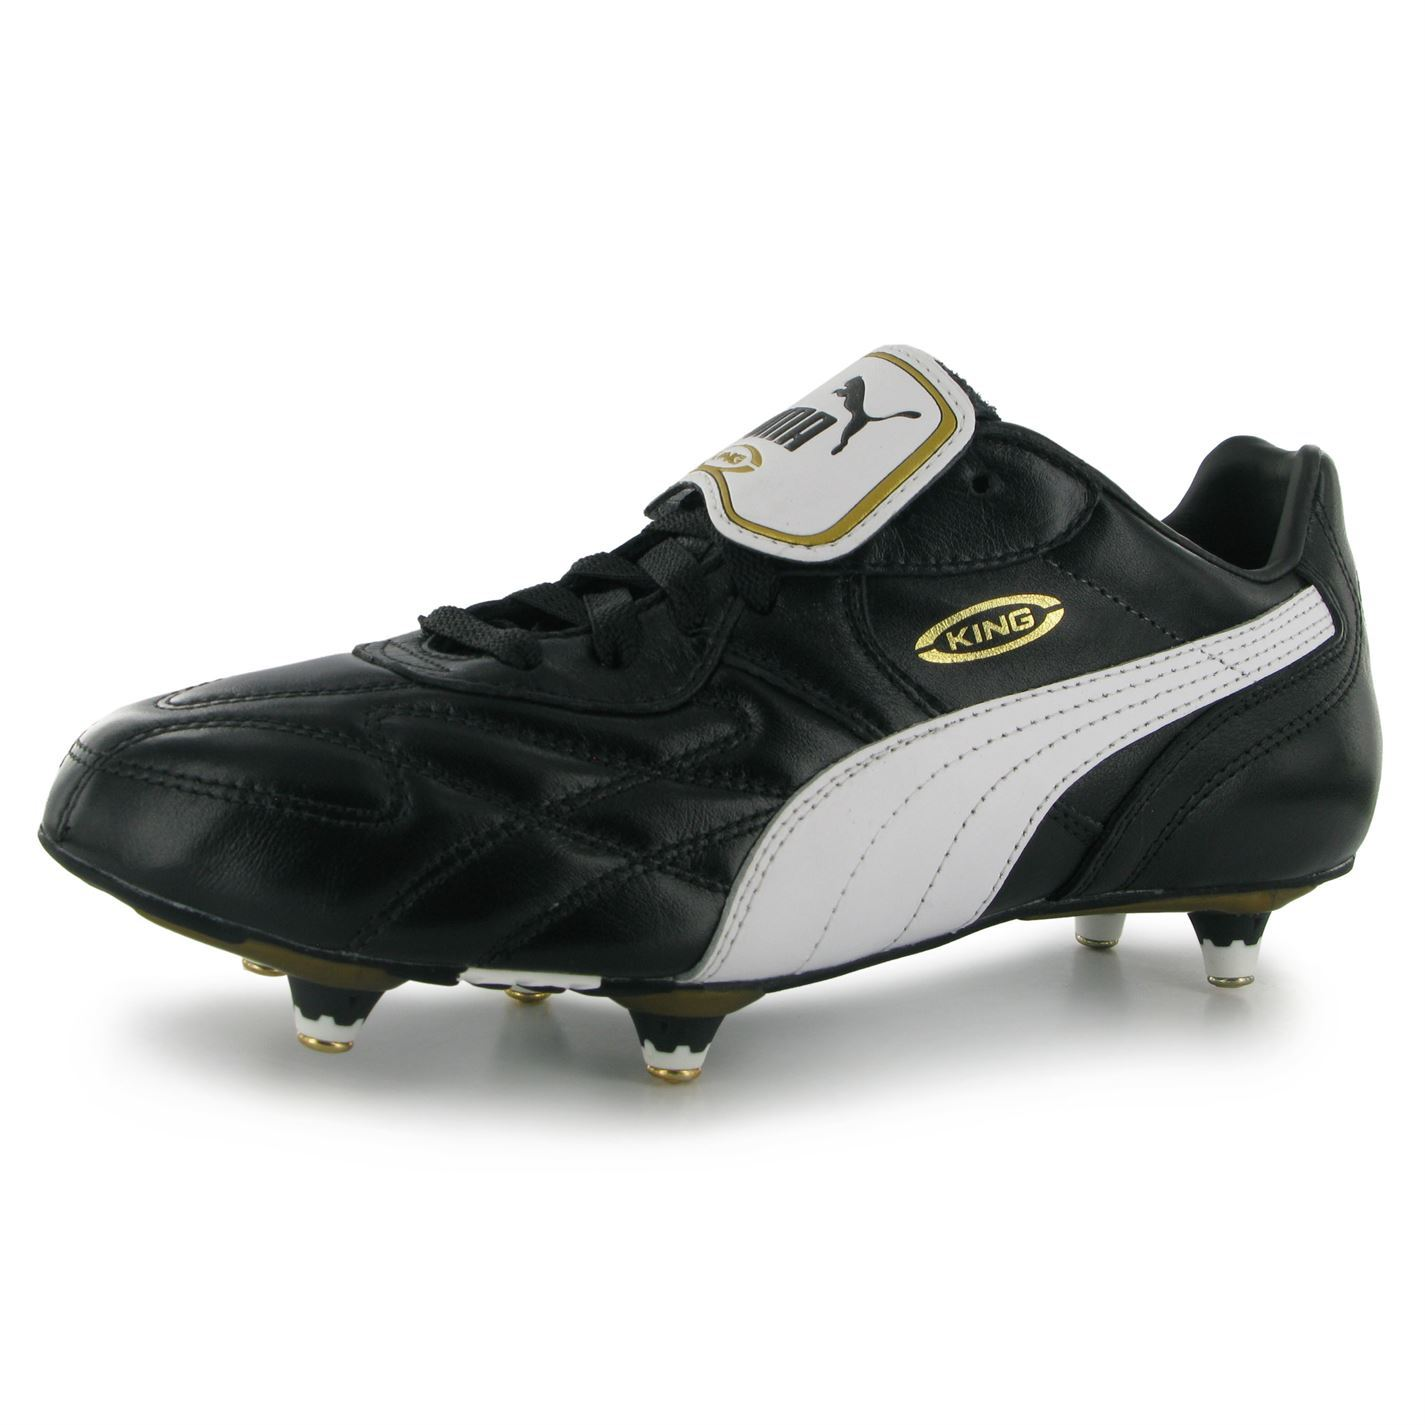 Puma King Pro Soft Ground Mens Football Boots BlackWhite